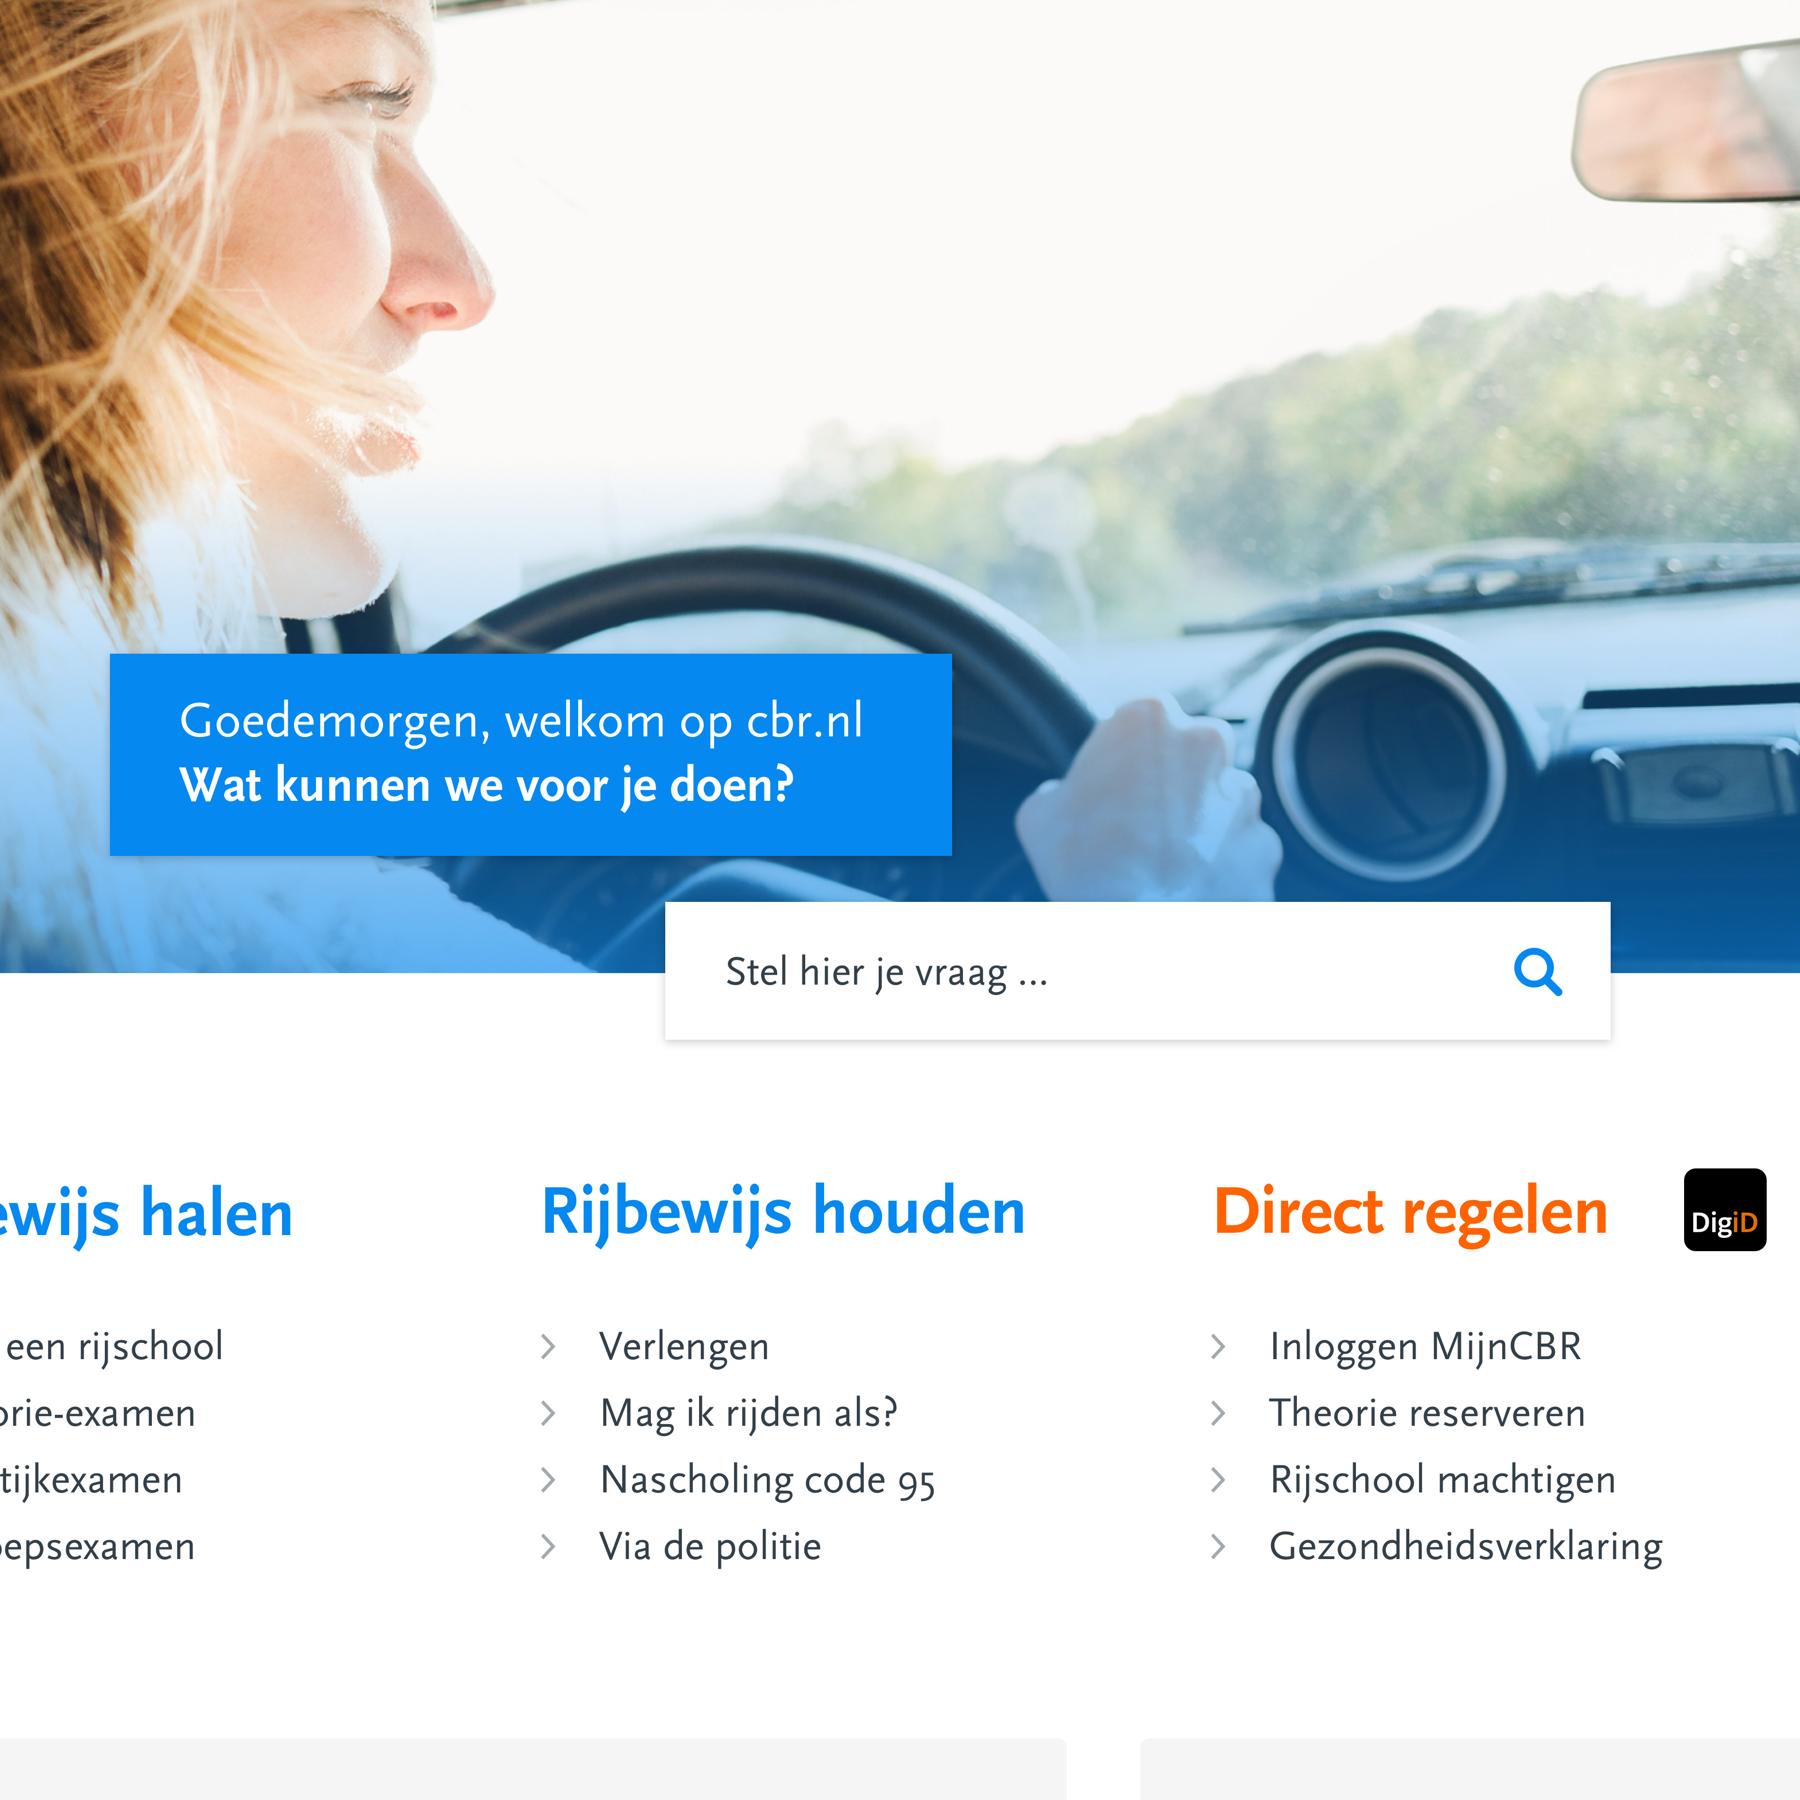 redesign_cbr_website_osage